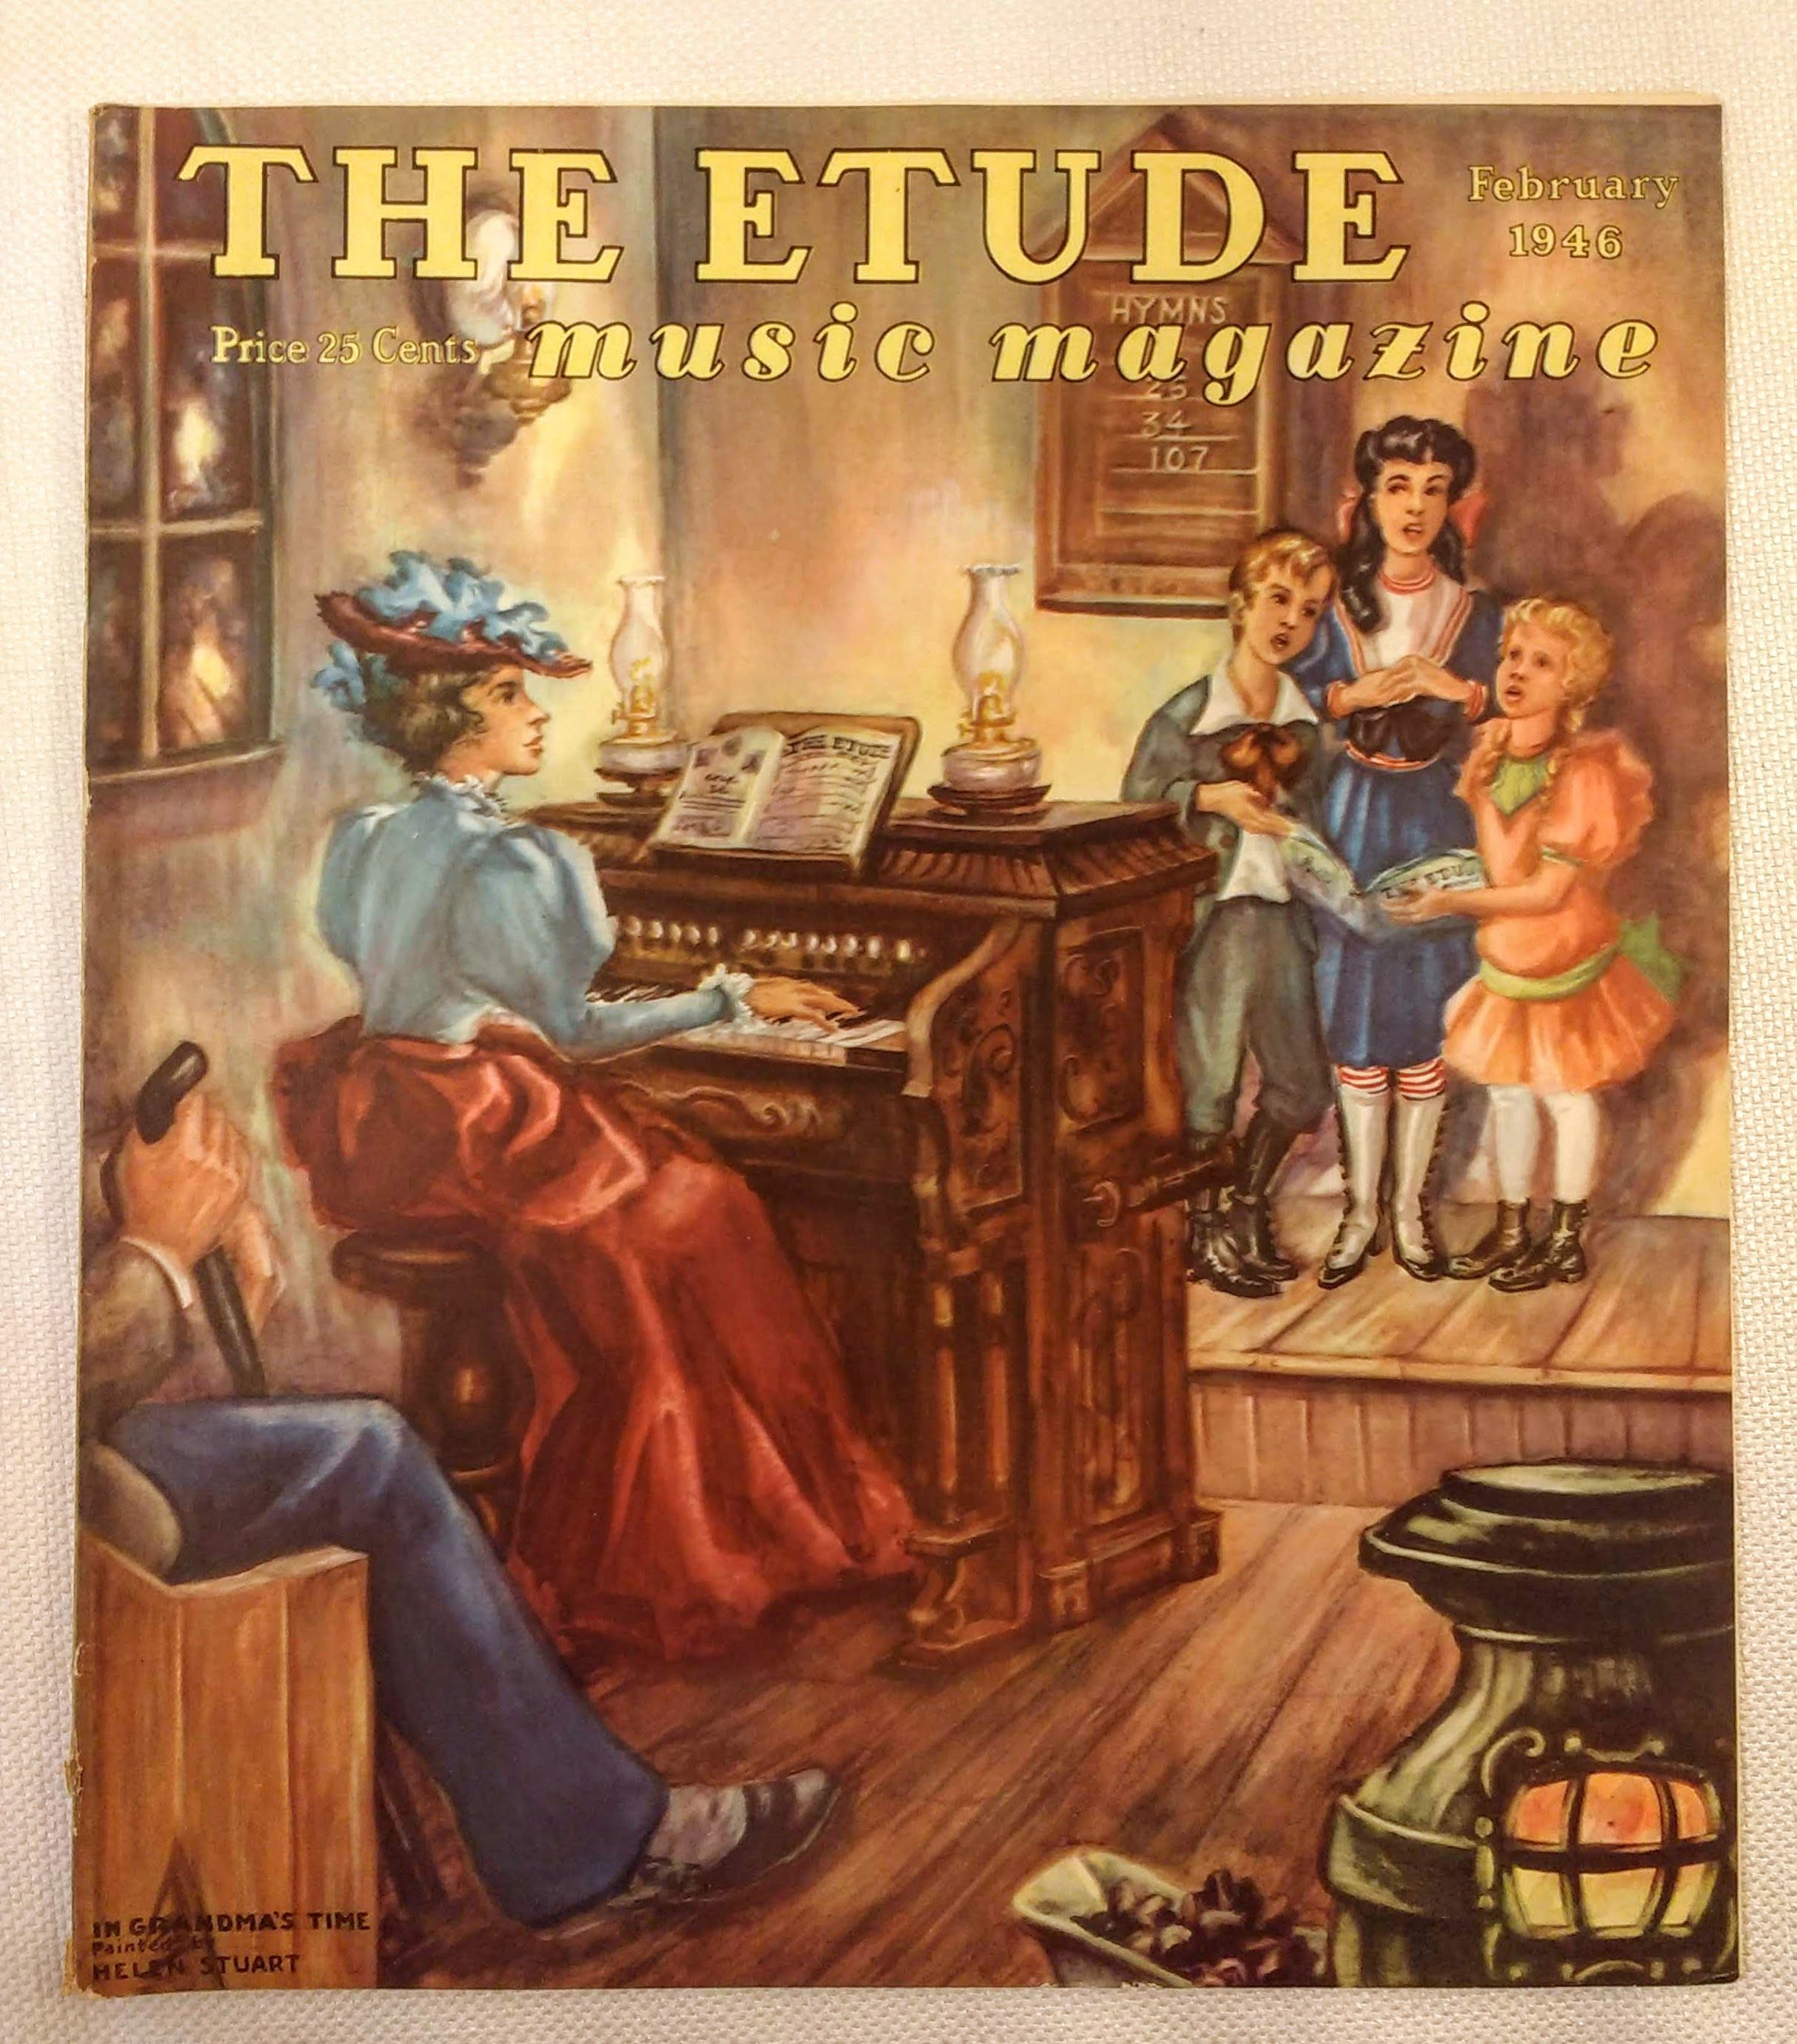 The Etude Music Magazine: Volume LXIV, No. 2; February, 1946, Cooke, James Francis [ed.]